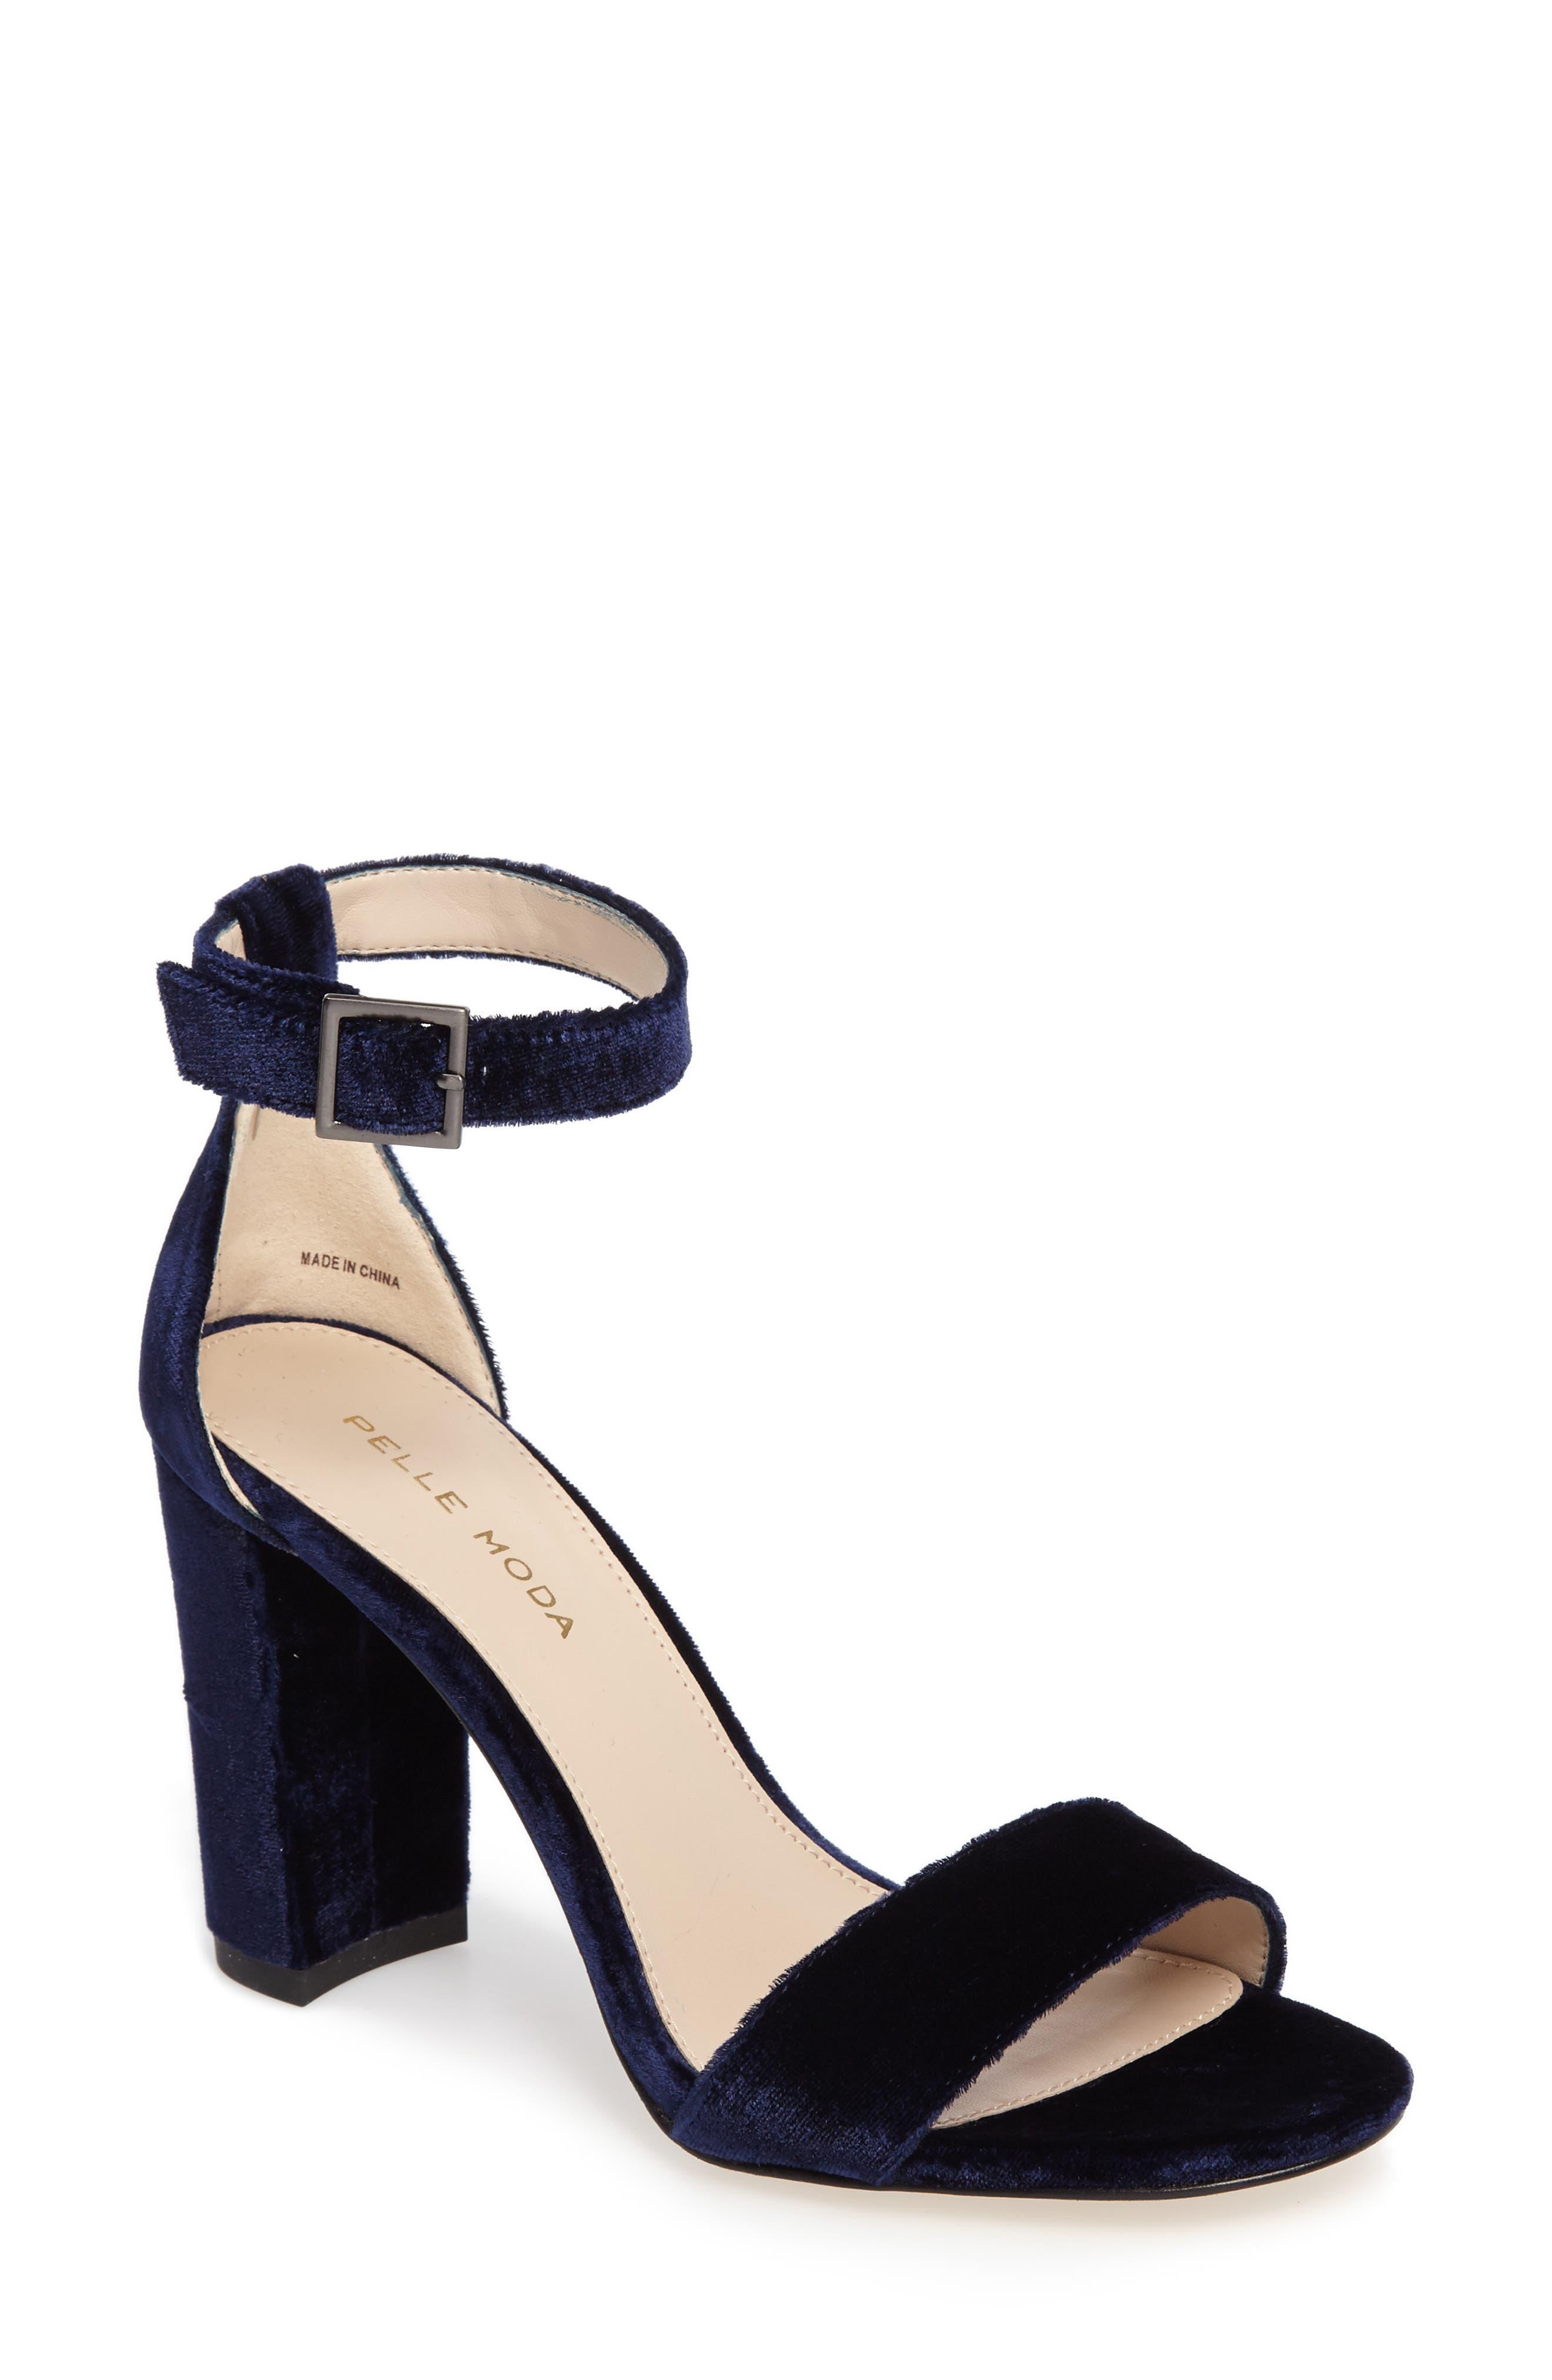 Bonnie Ankle Strap Sandal,                             Main thumbnail 1, color,                             Midnight